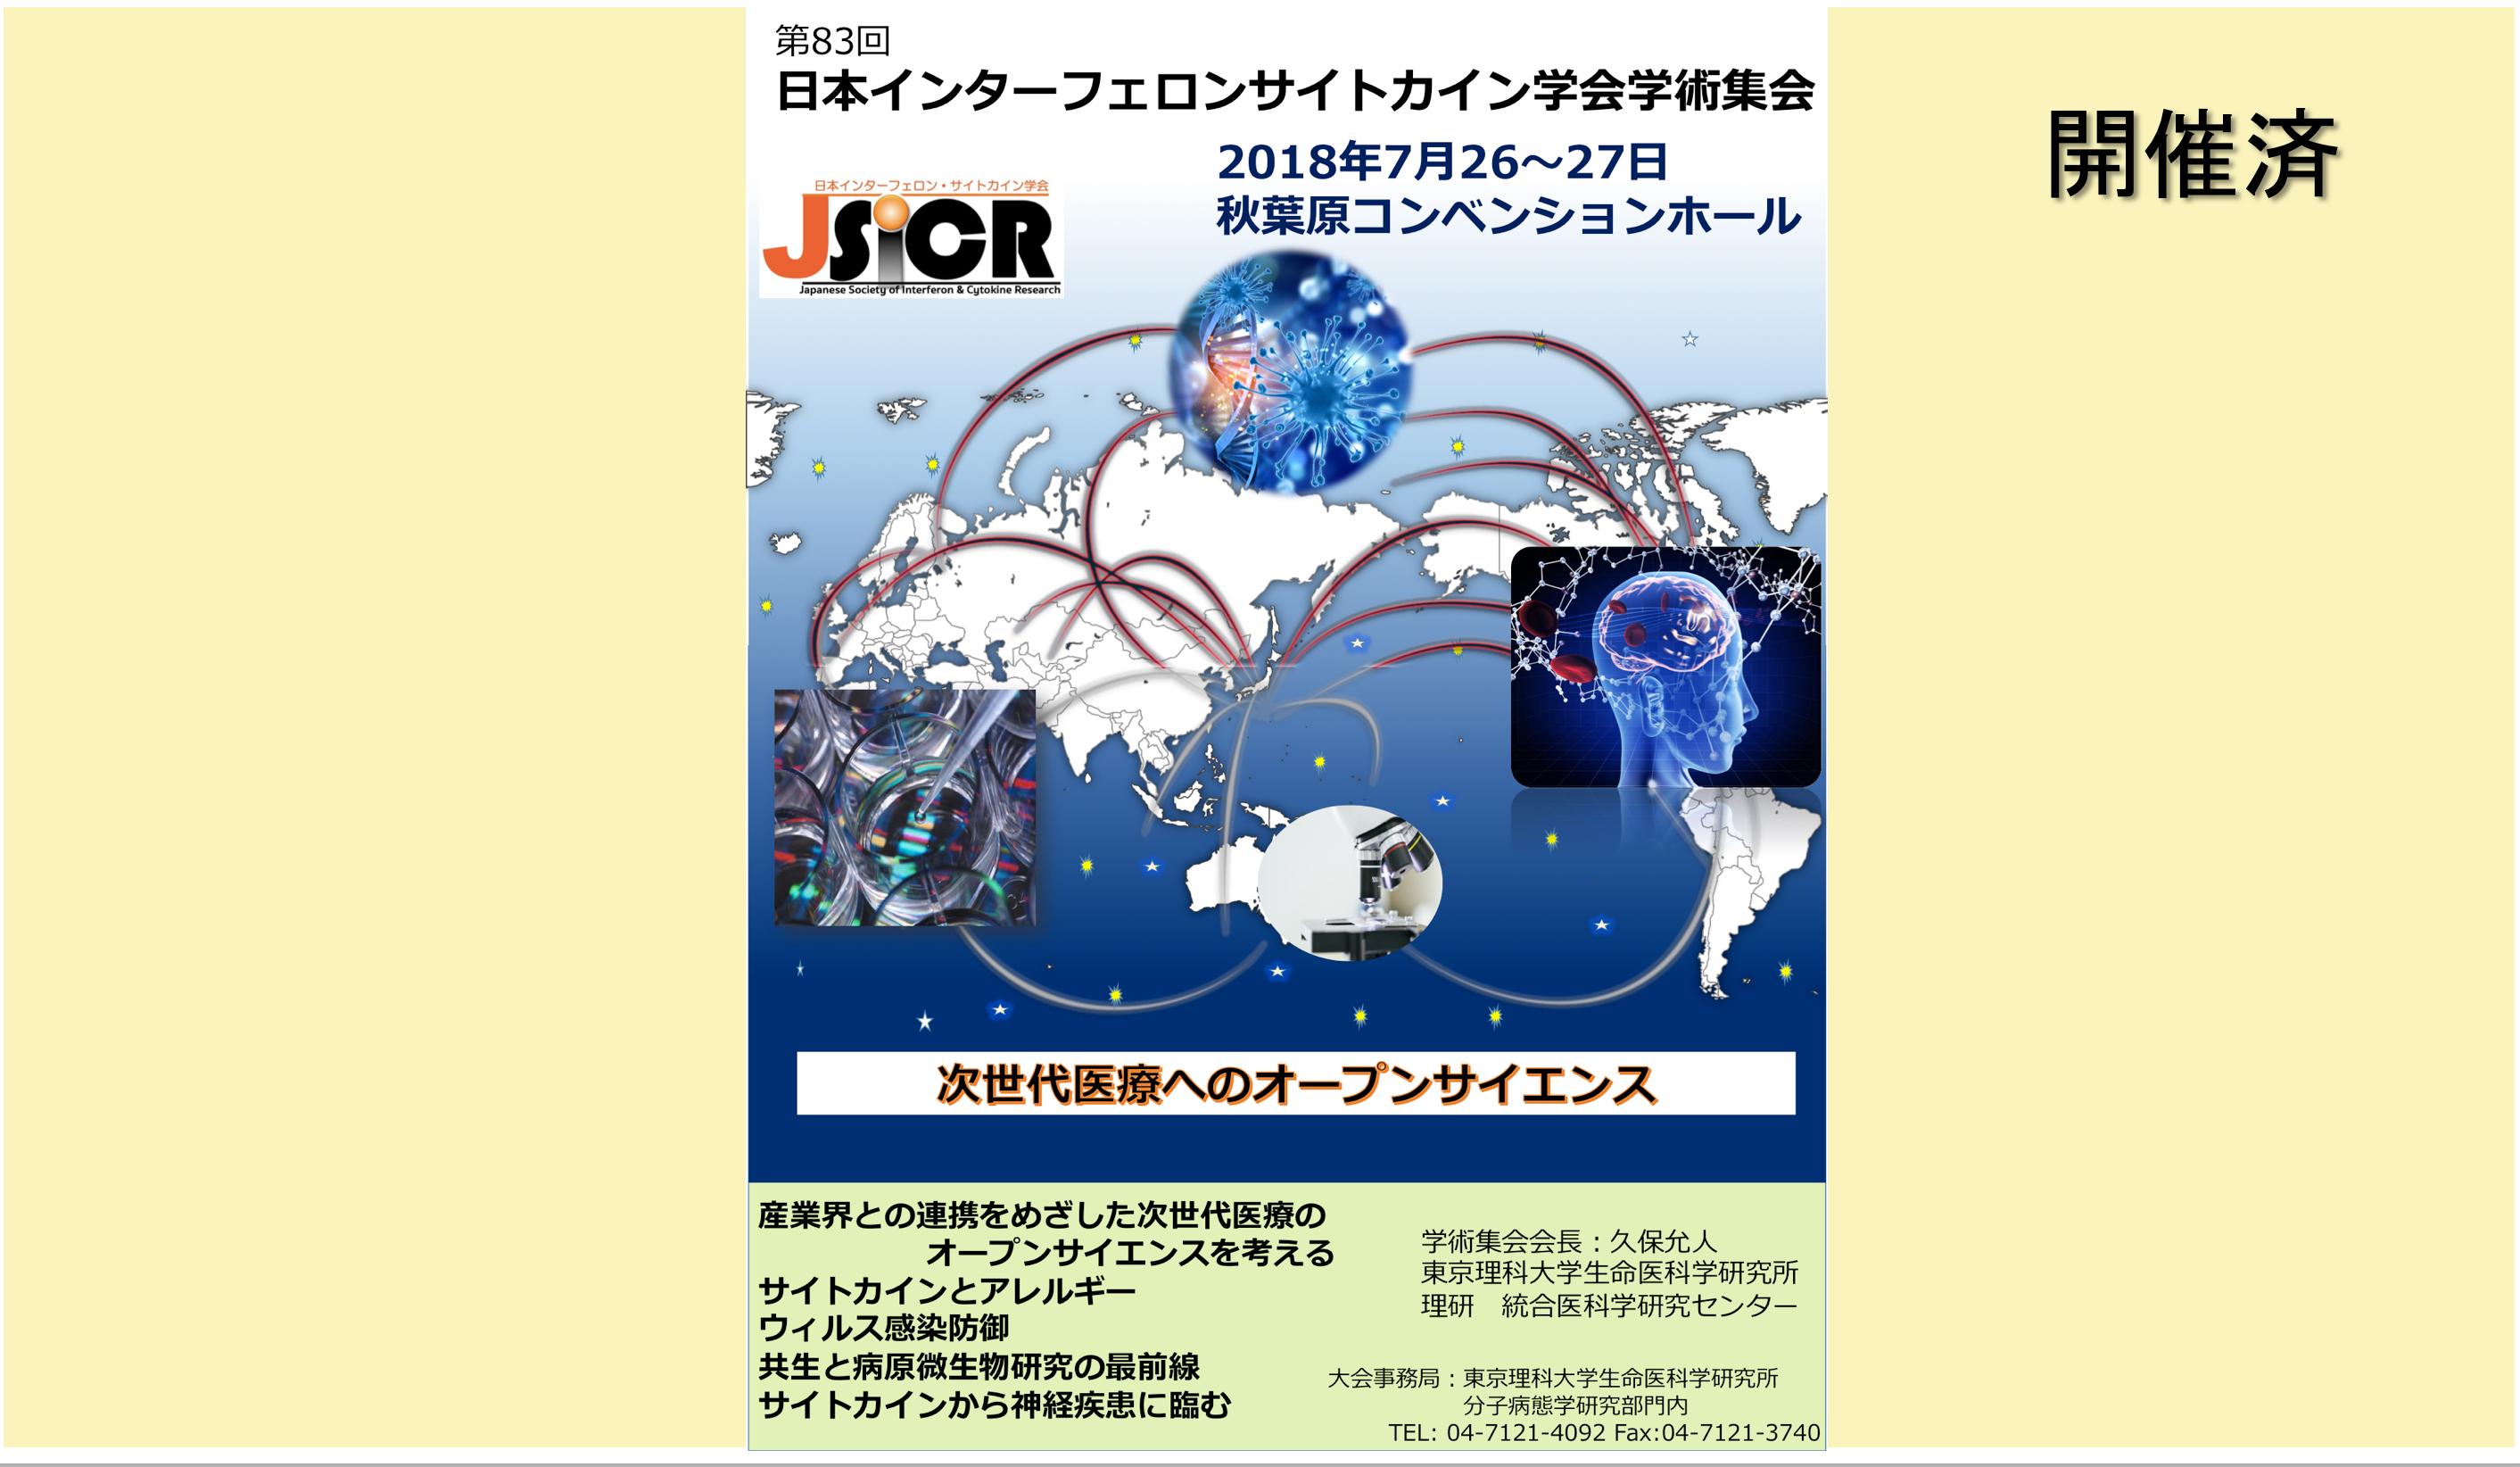 JSICR2018